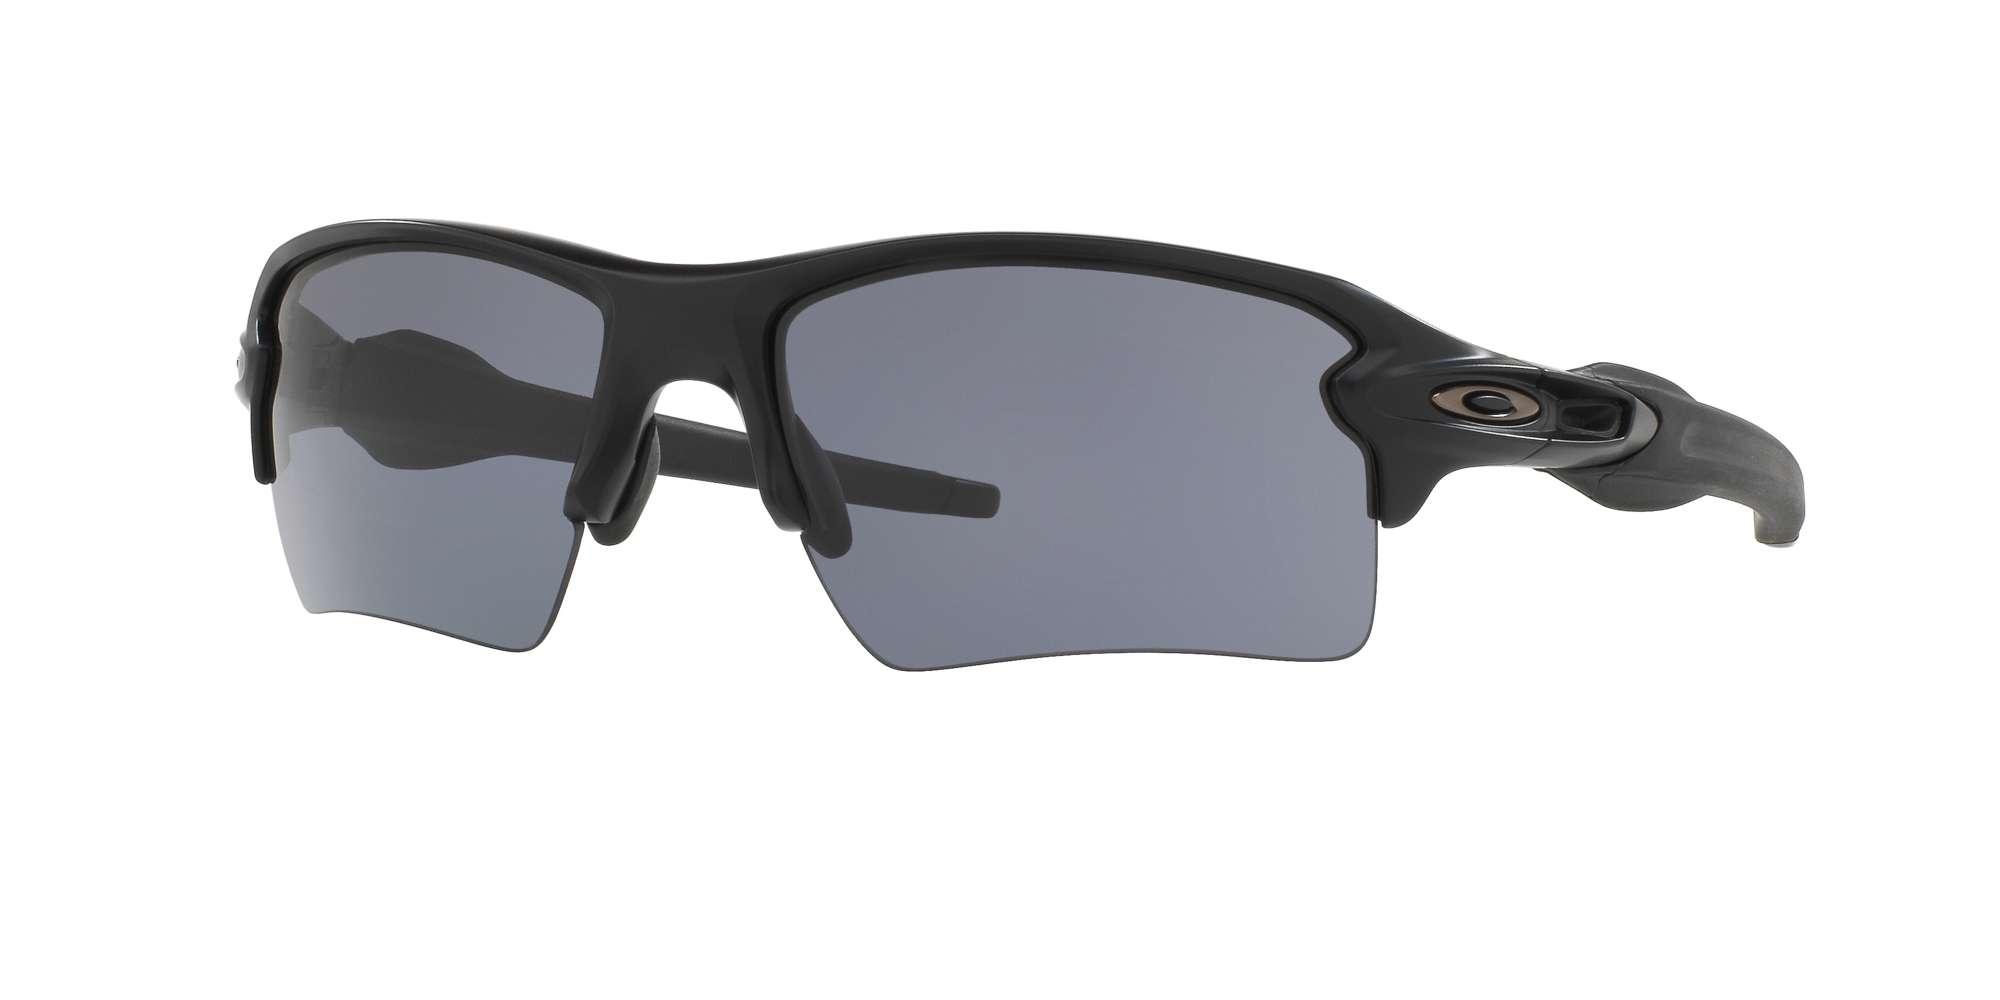 MATTE BLK / grey lenses